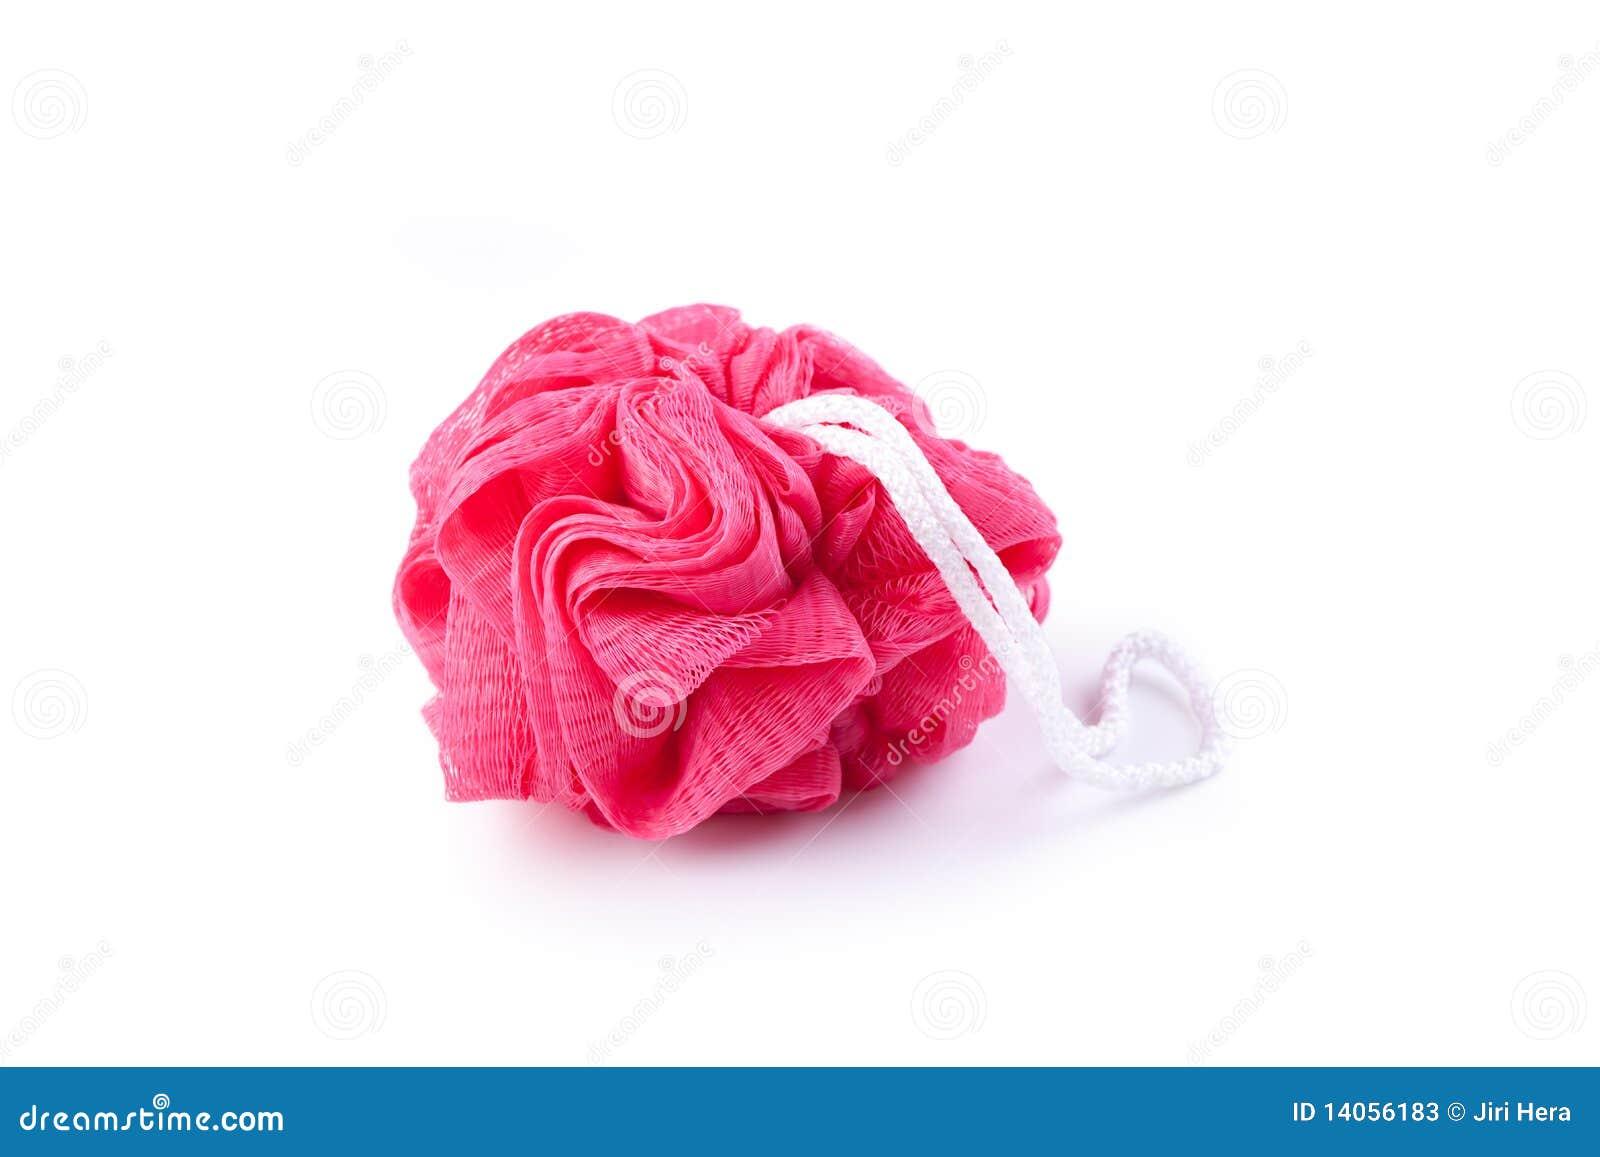 Plastic bath sponge